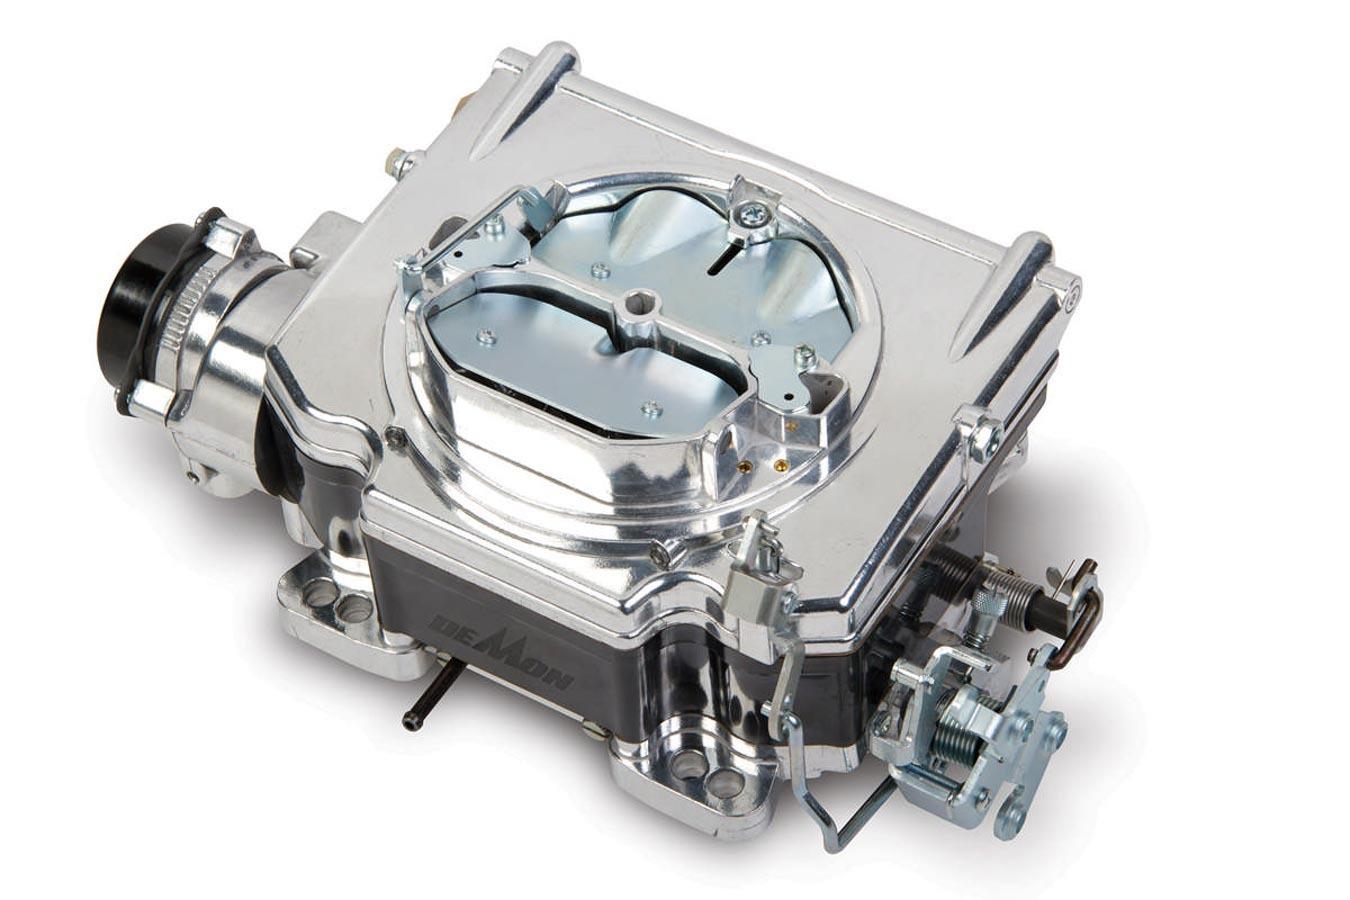 Demon Carburetion 1904 Carburetor, Street Demon, 4-Barrel, 750 CFM, Spread / Square Bore, Electric Choke, Vacuum Secondary, Single Inlet, Black / Burnished, Each